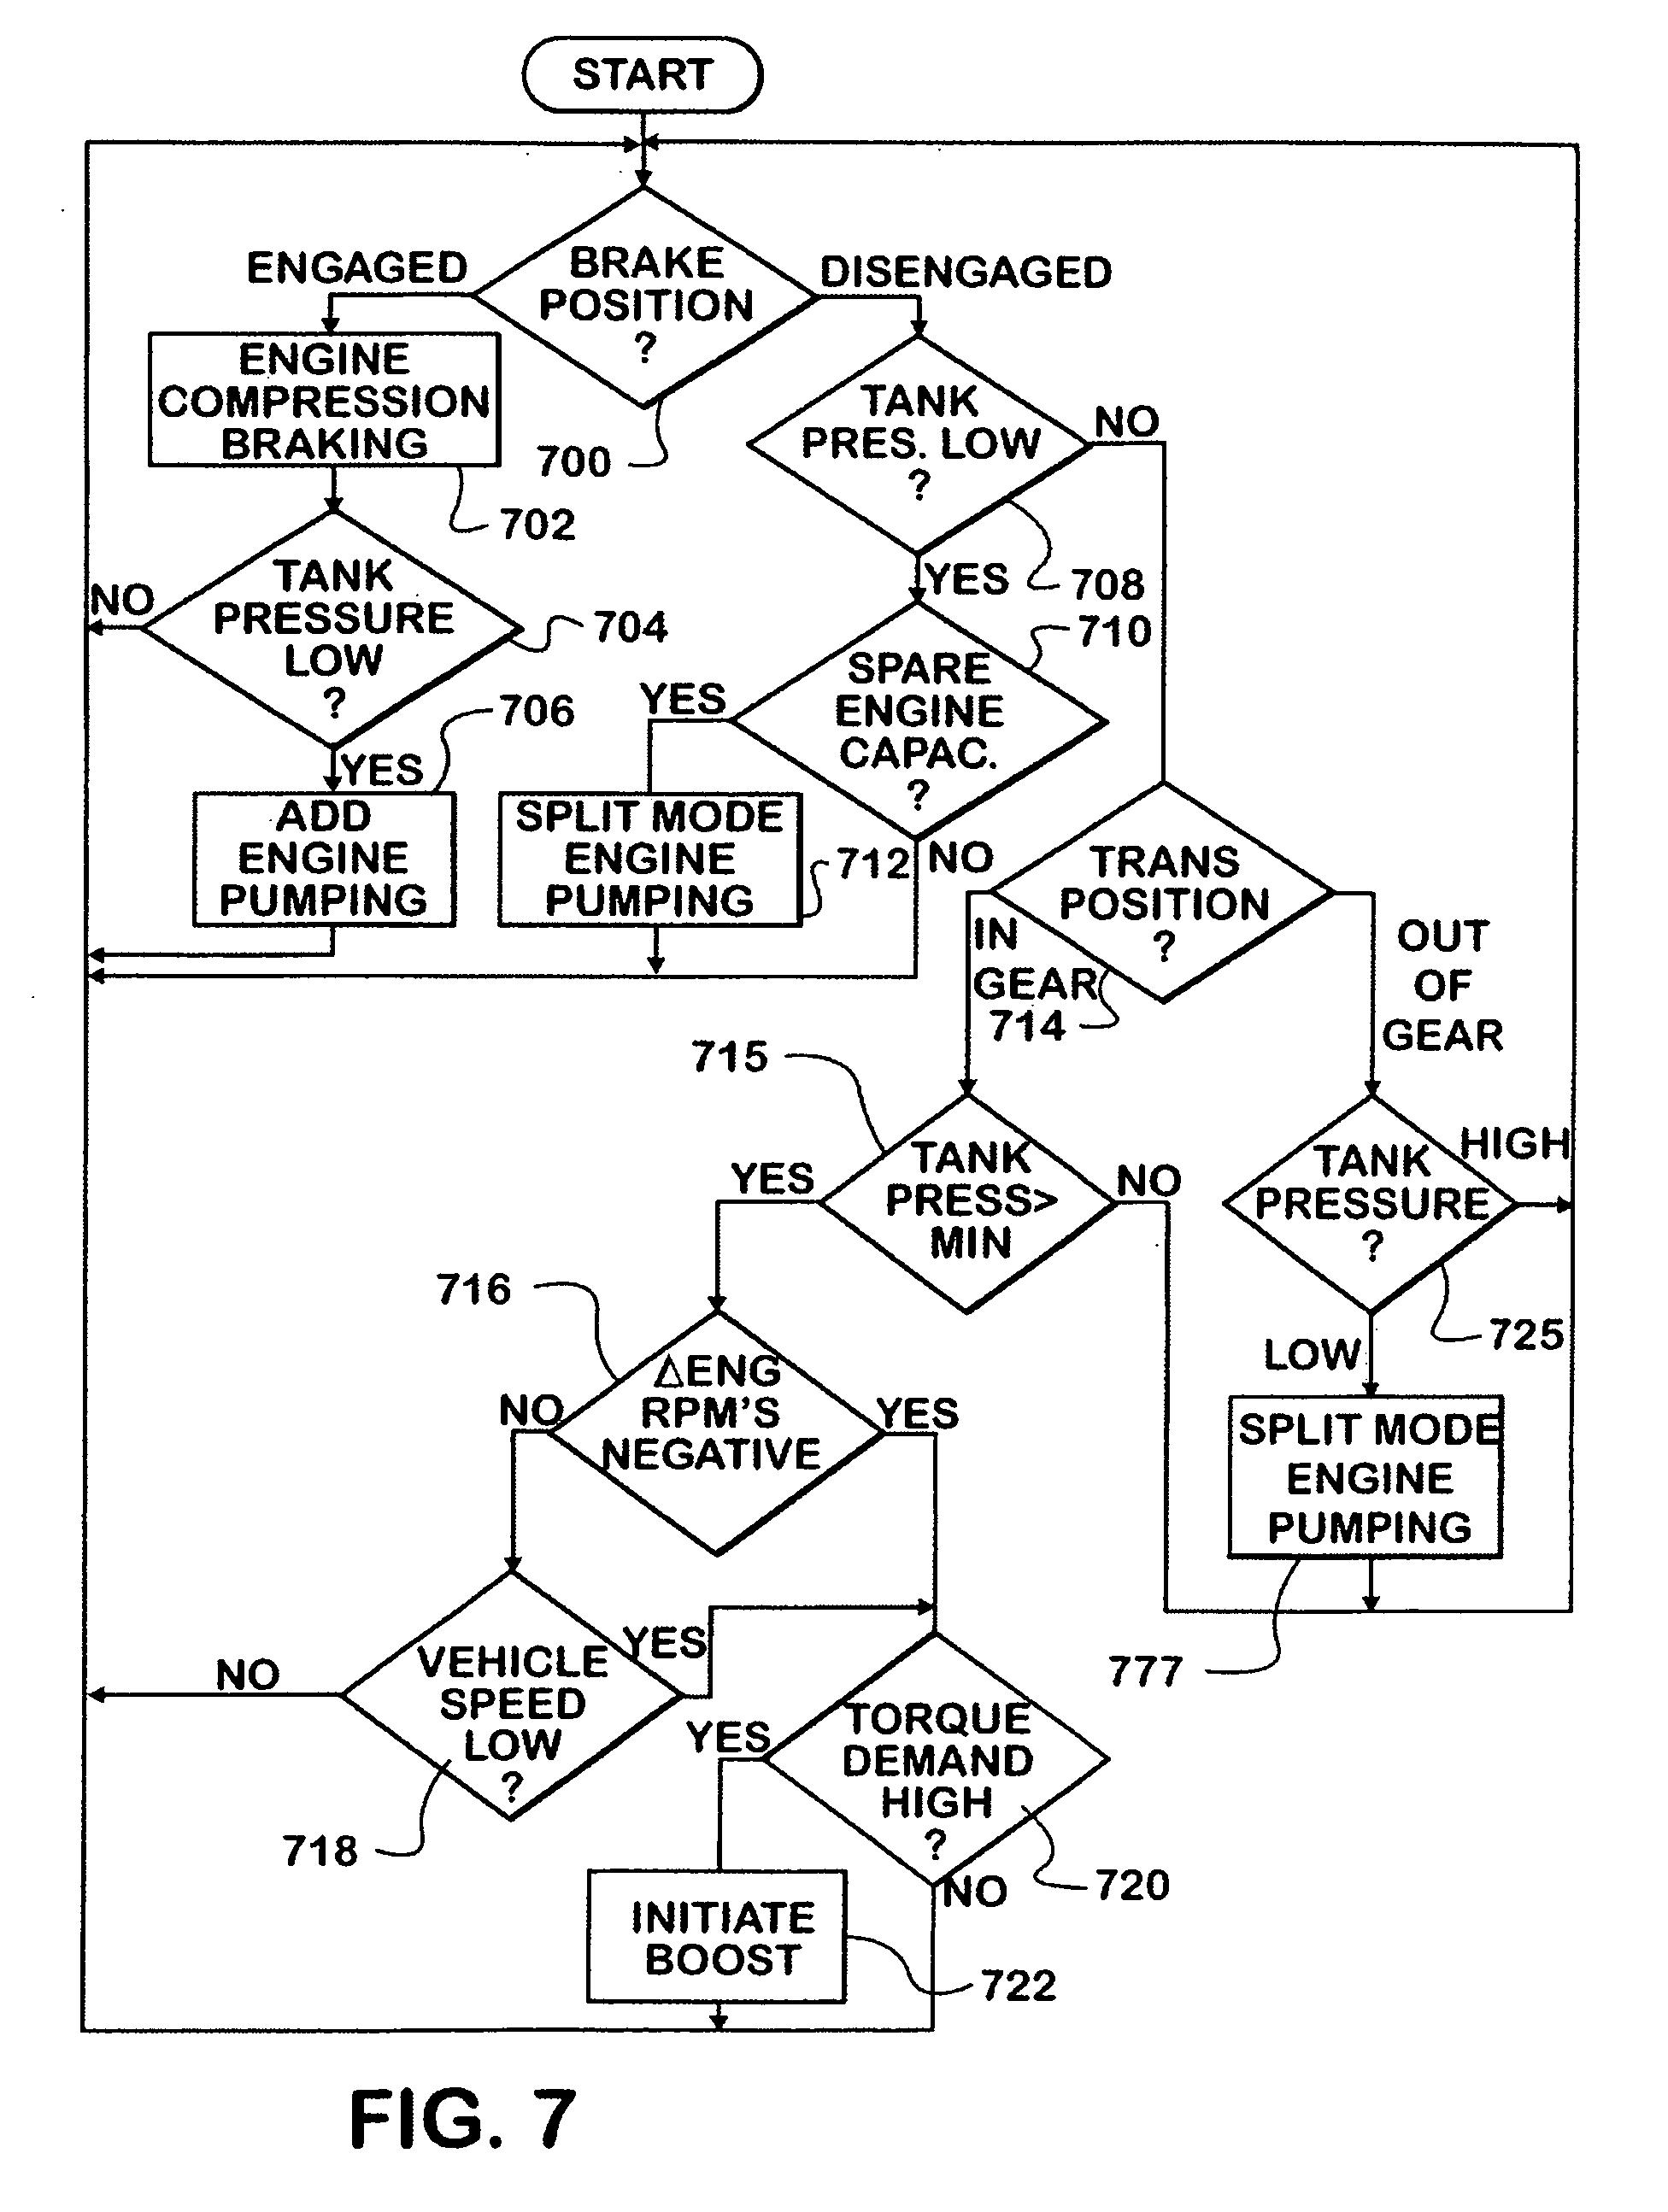 706 Gas Engine Diagram. Parts. Auto Parts Catalog And Diagram